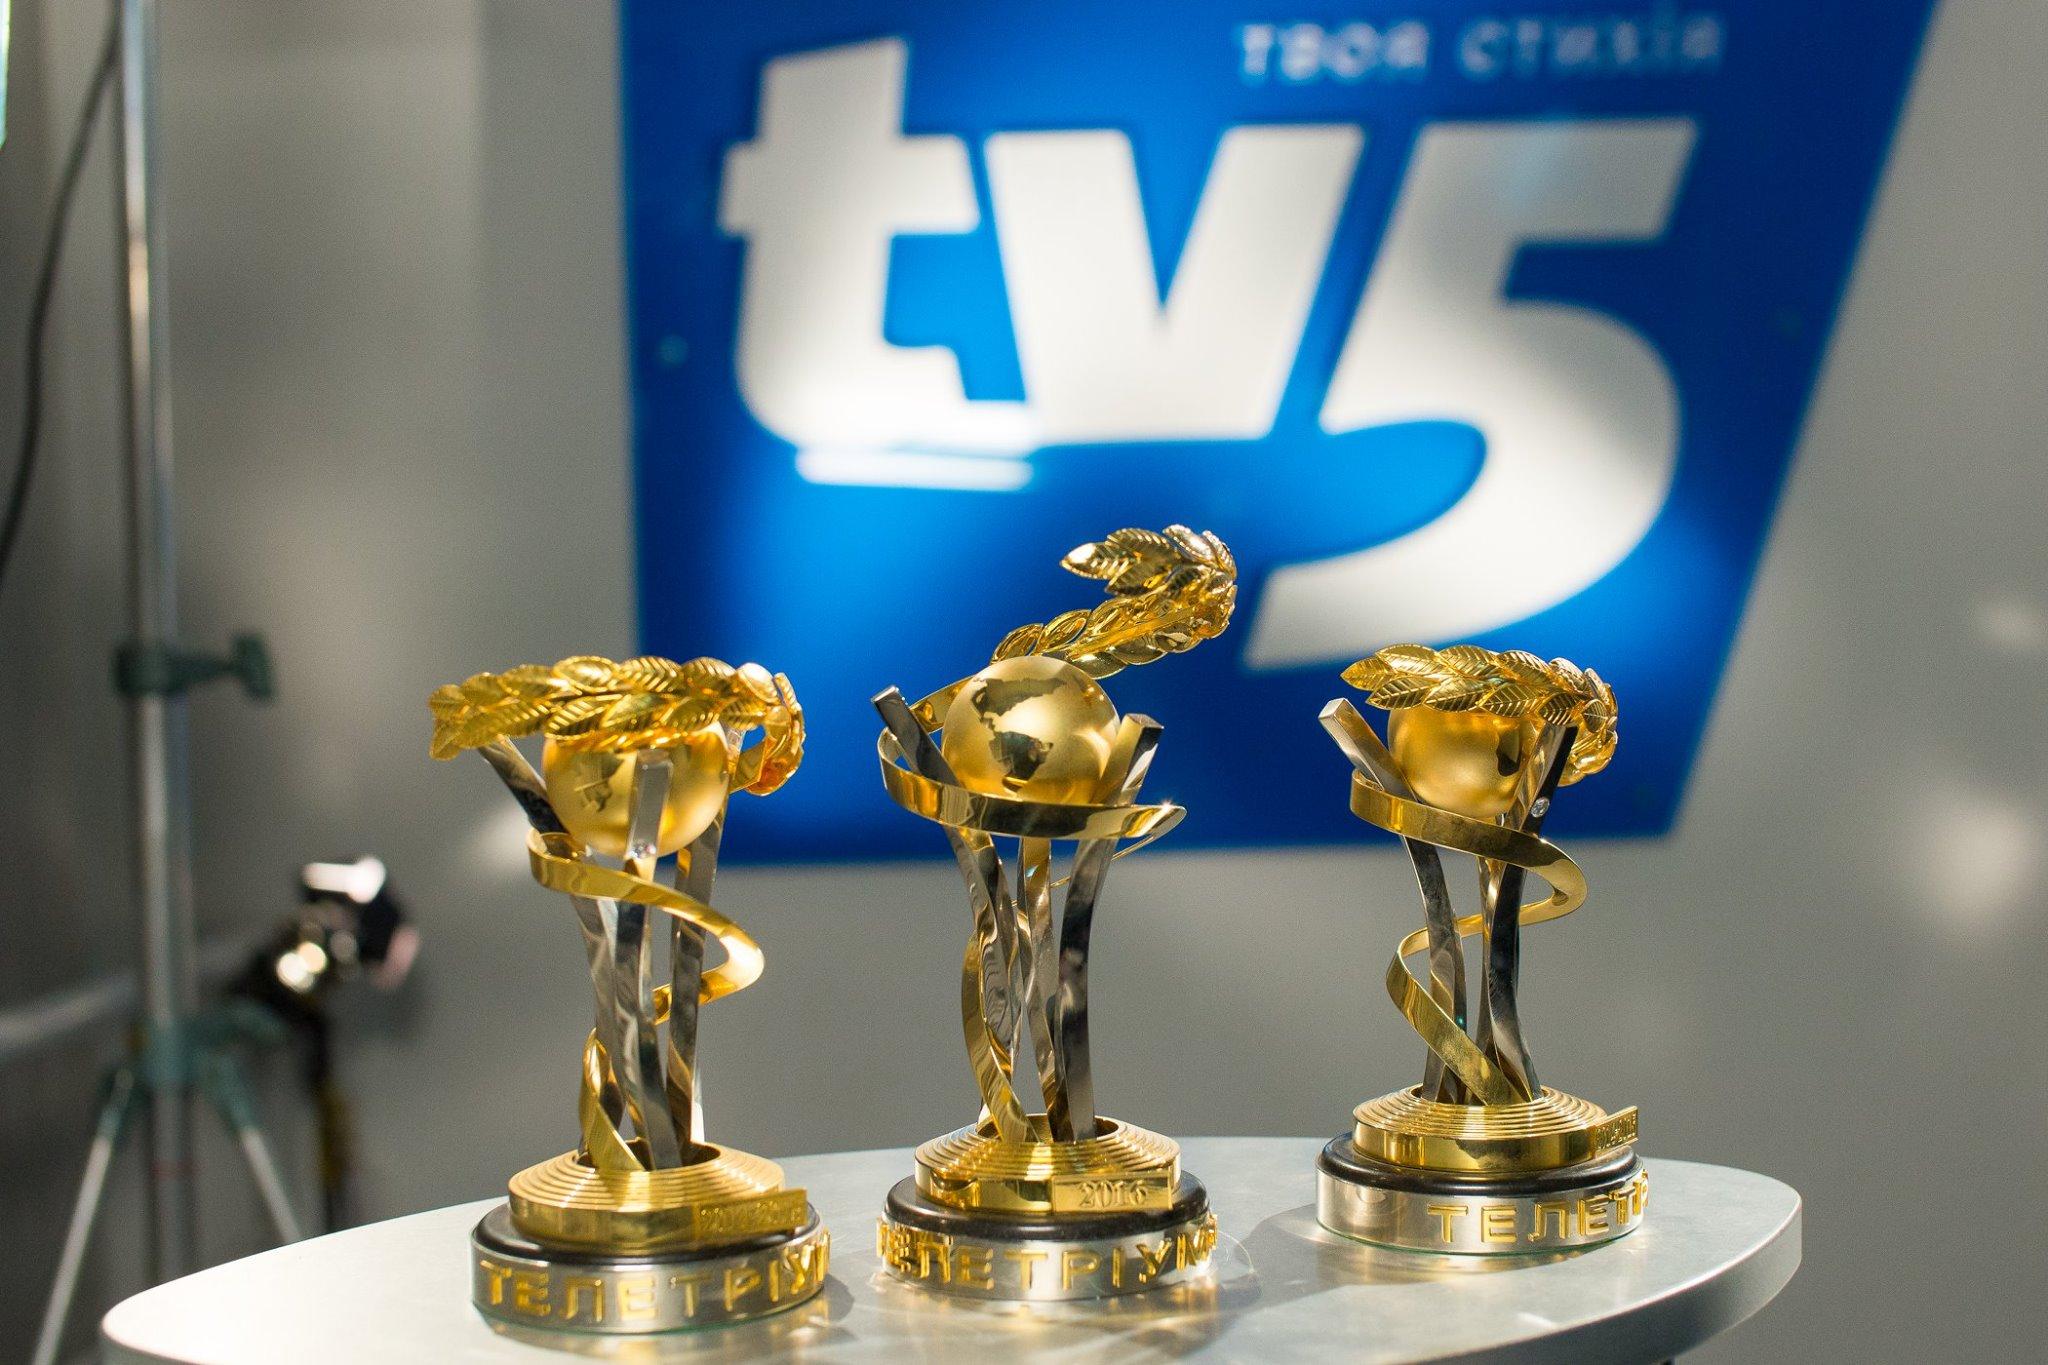 15 заявок от запорожского телеканала TV5 вошли в шорт-лист премии Телетриумф